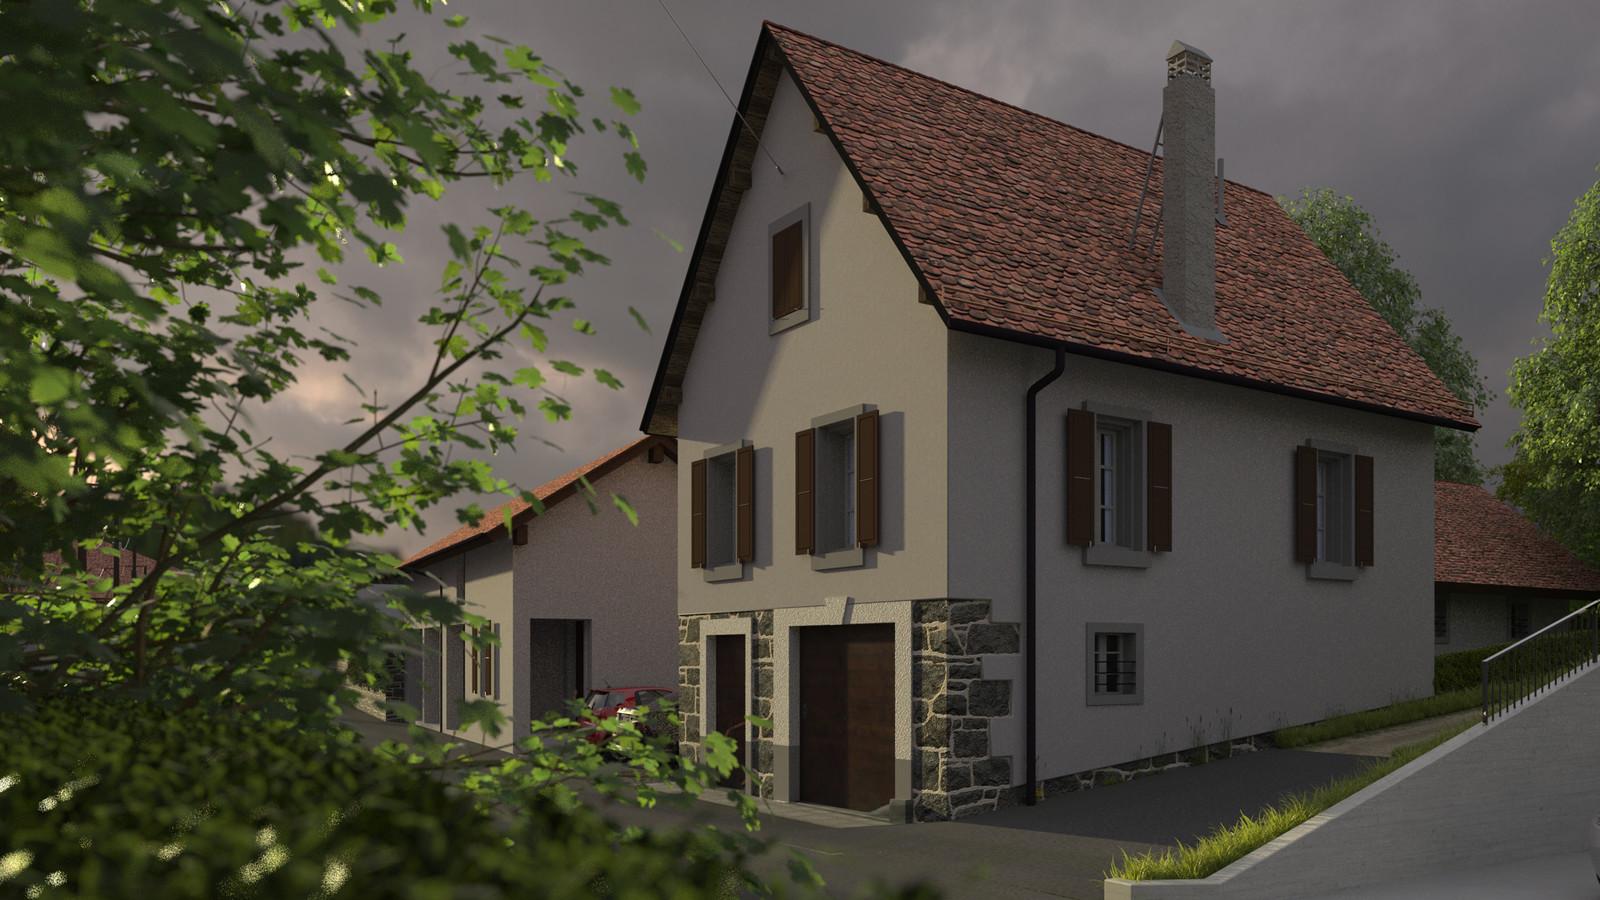 SketchUp + Thea Render  Little Swiss House Scene 28 0743 Cloudy Morning Sun 01 HD 1920 x 1080 Presto MC